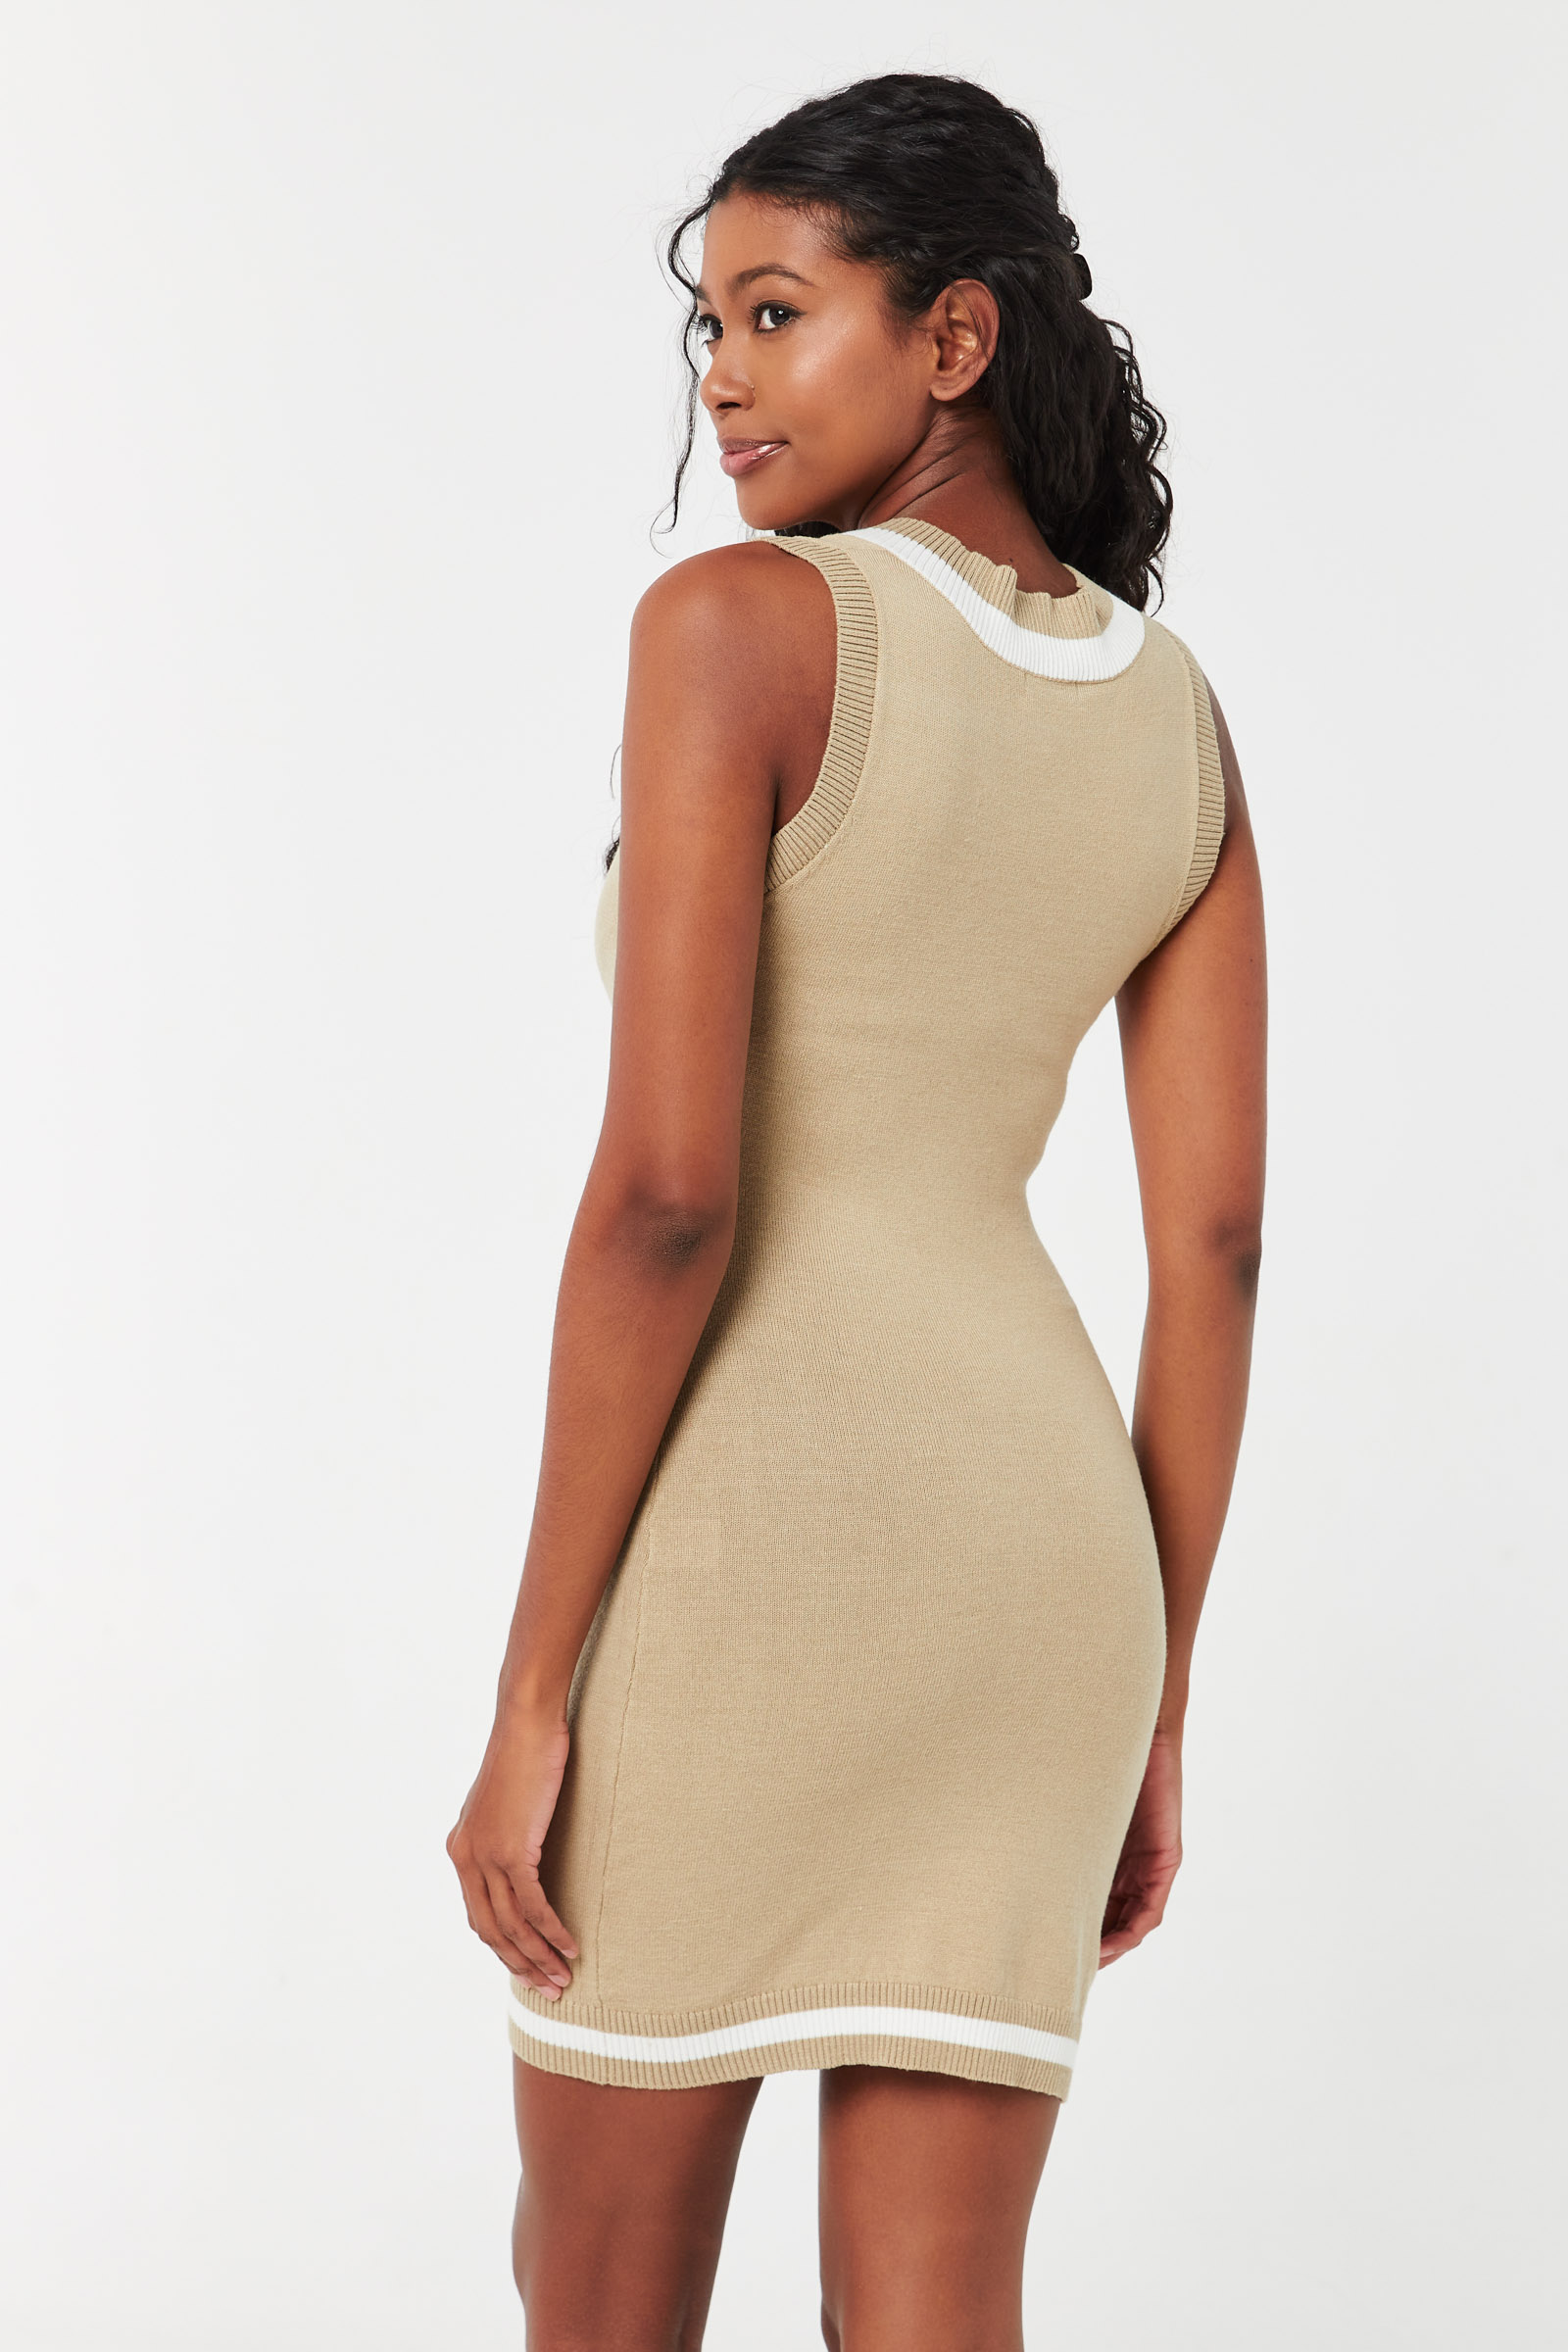 Sweater-Vest Dress